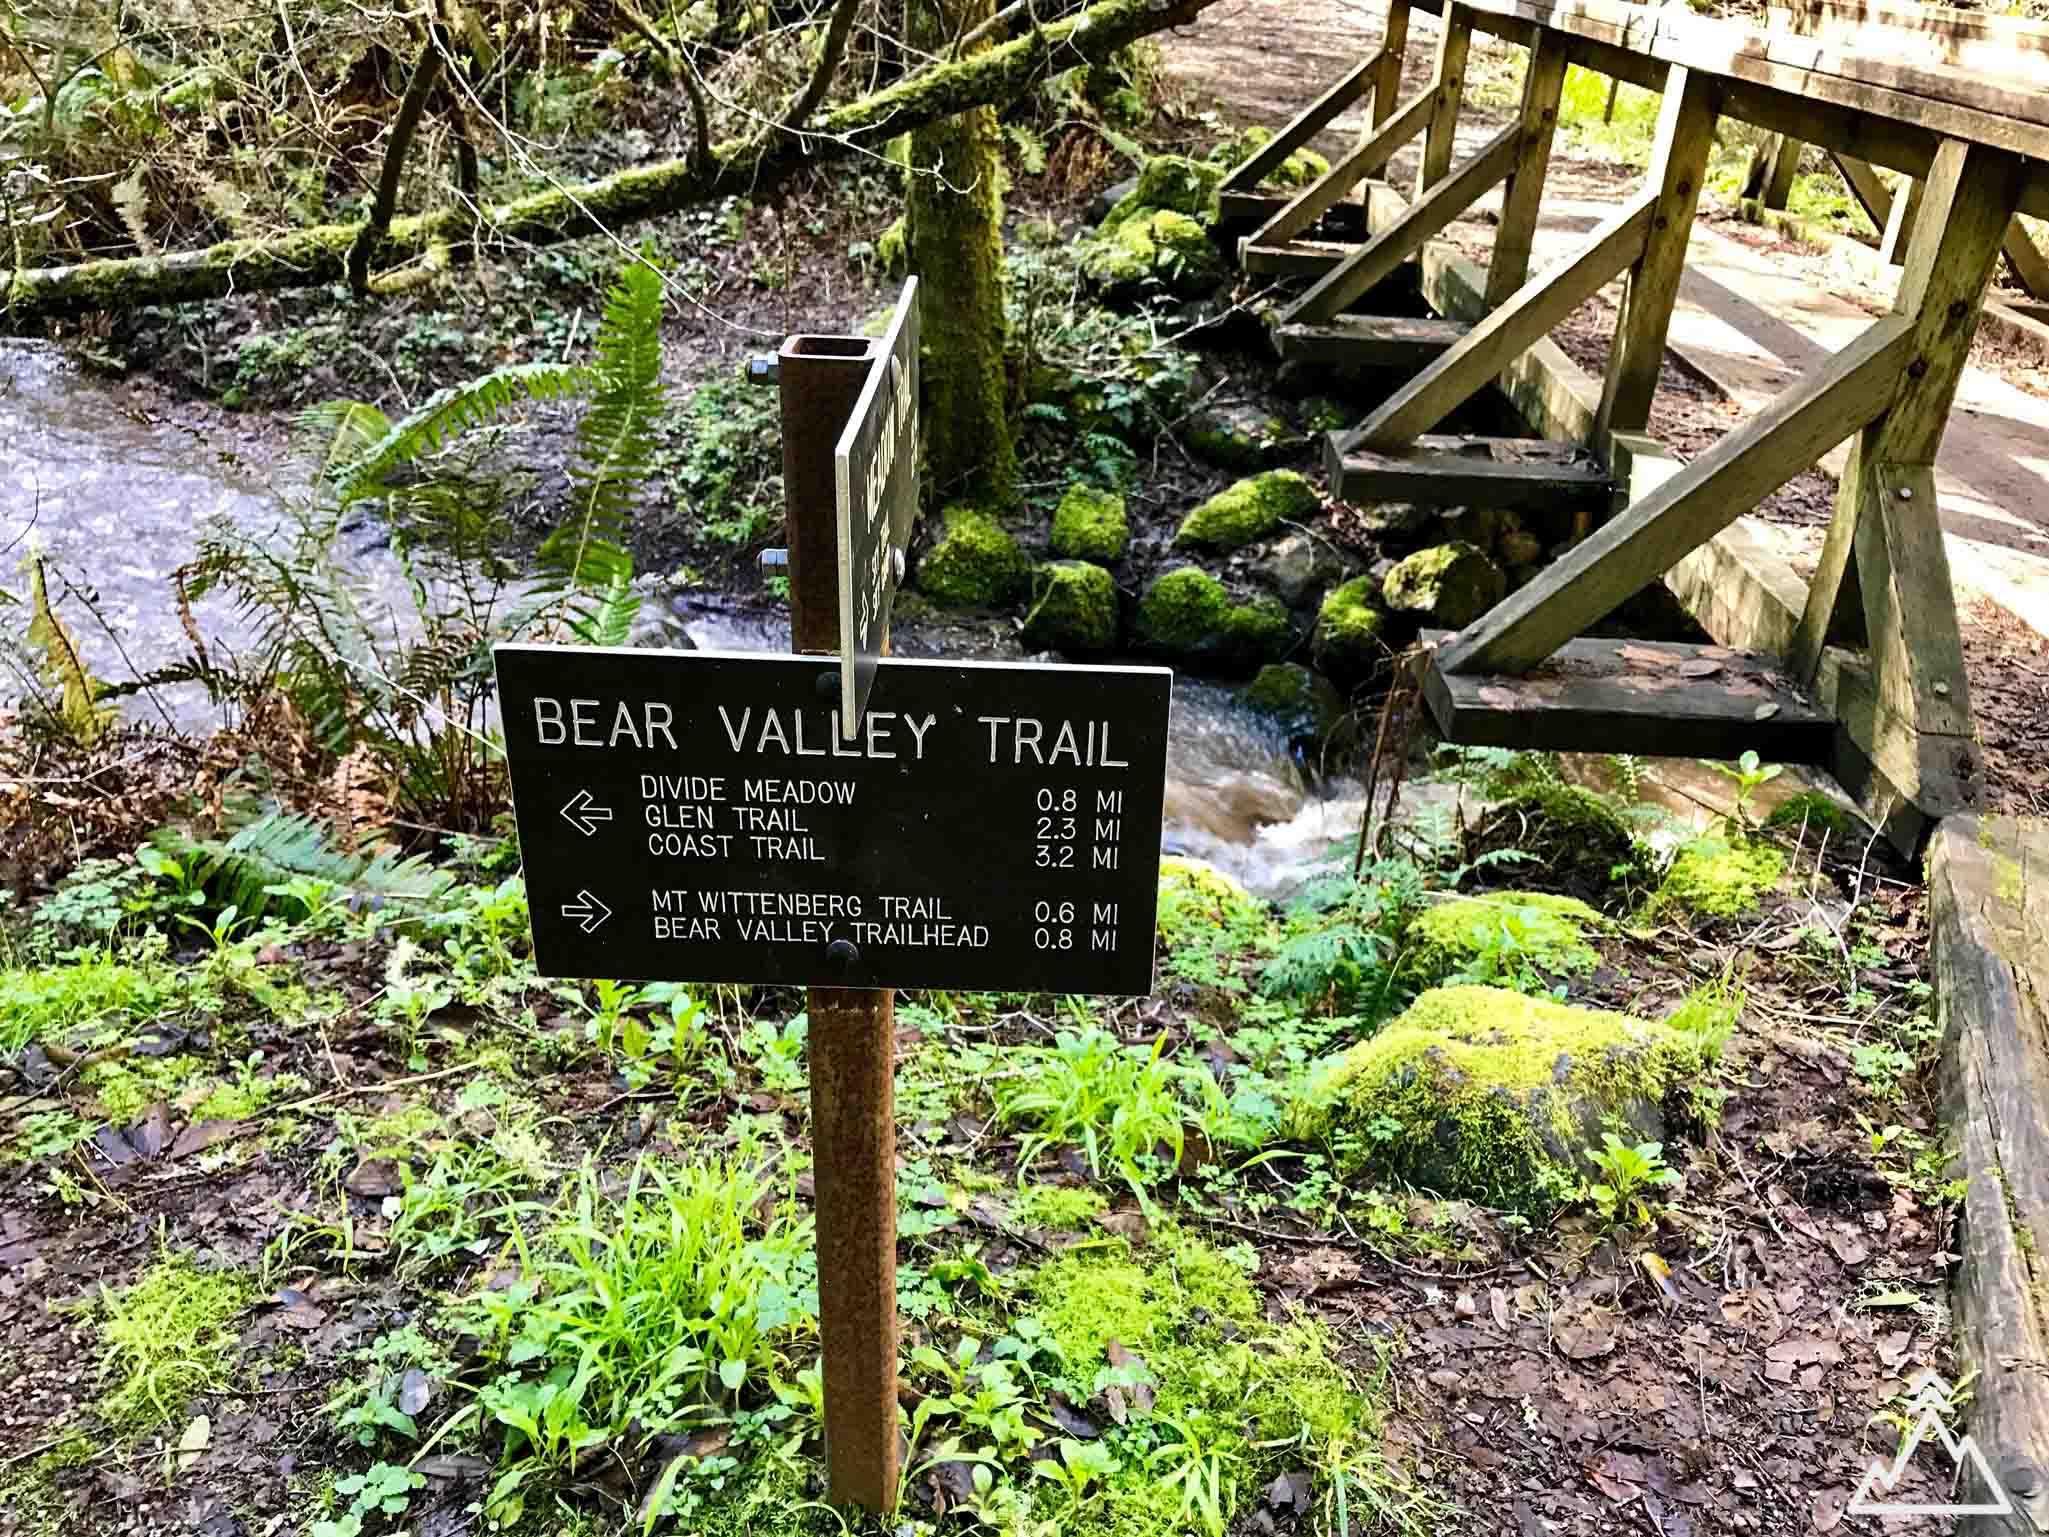 Bear Valley Trail